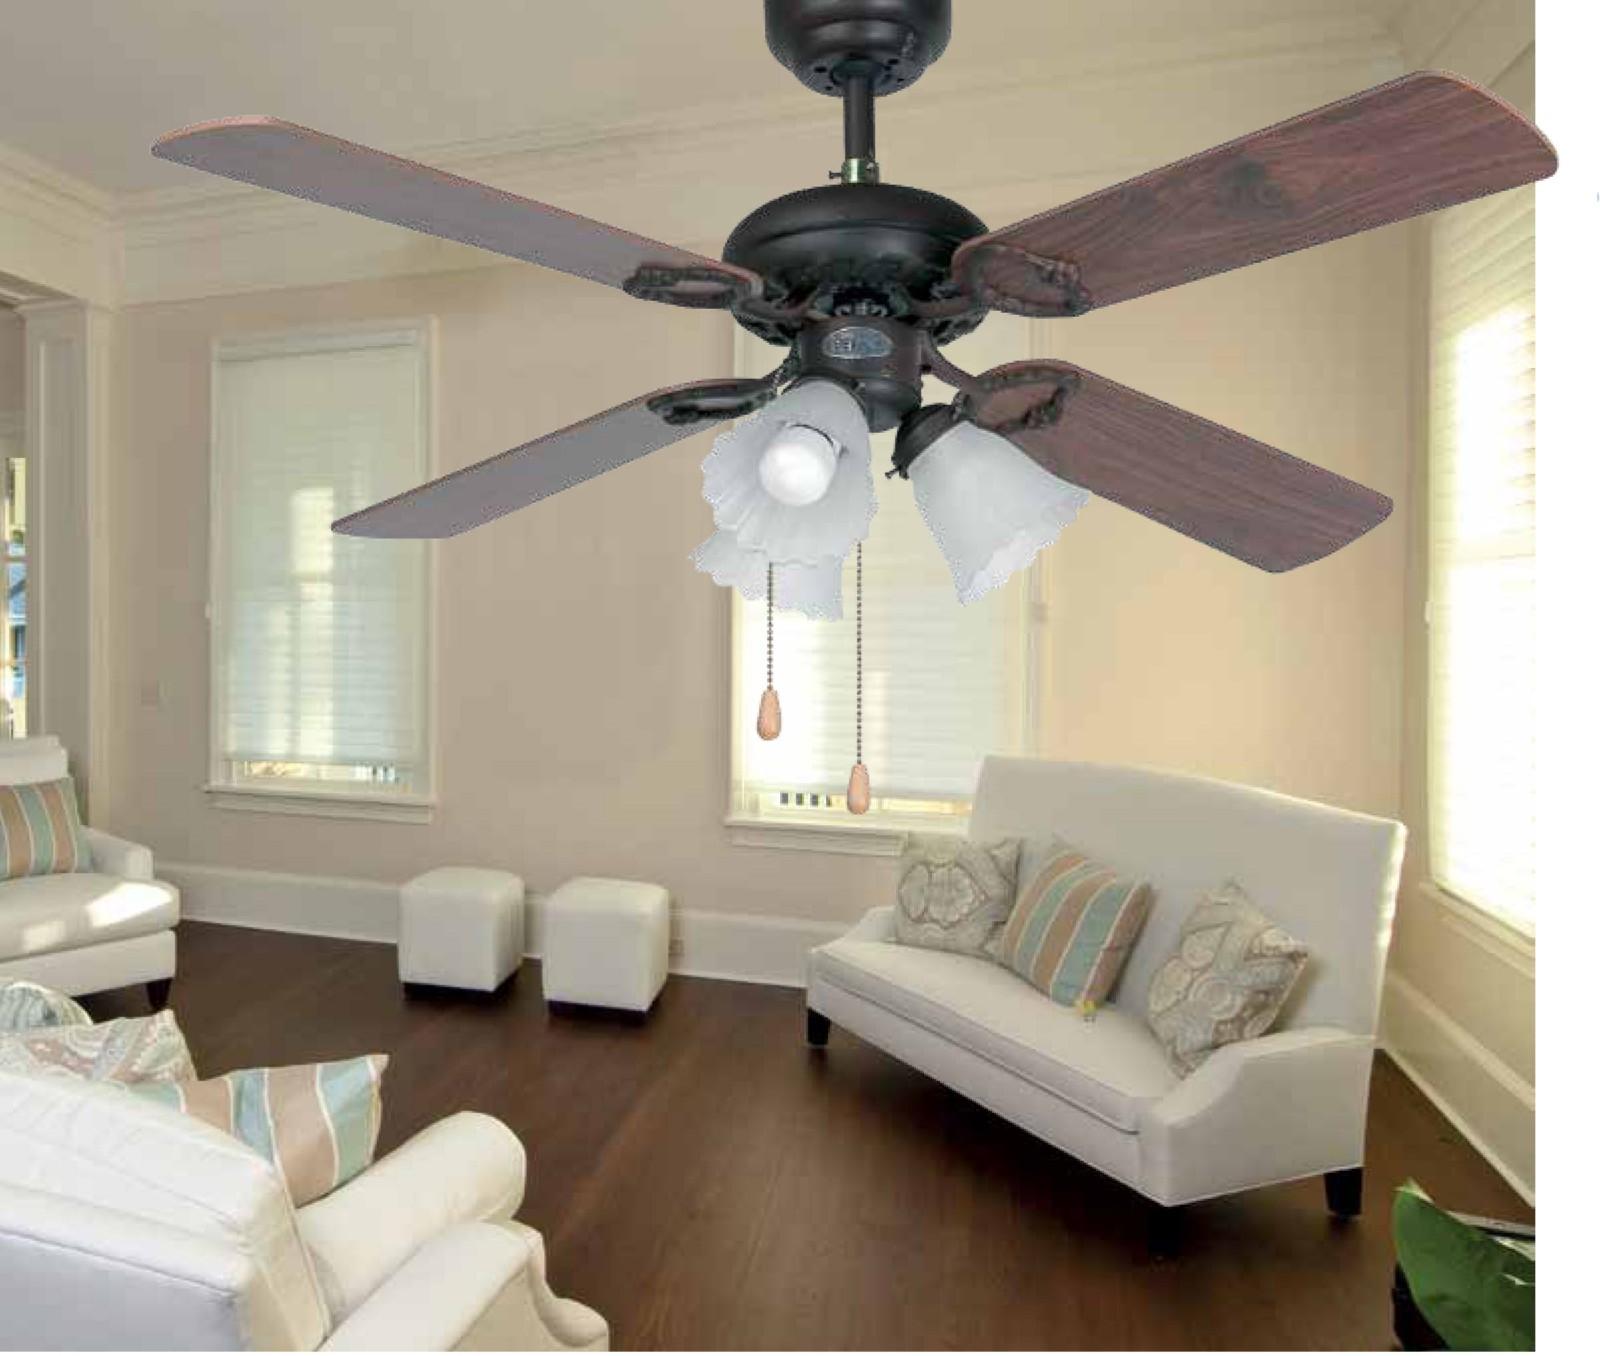 Faro ventilateur de plafond lisbo 107 cm avec clairage - Ventilateur de plafond avec eclairage ...